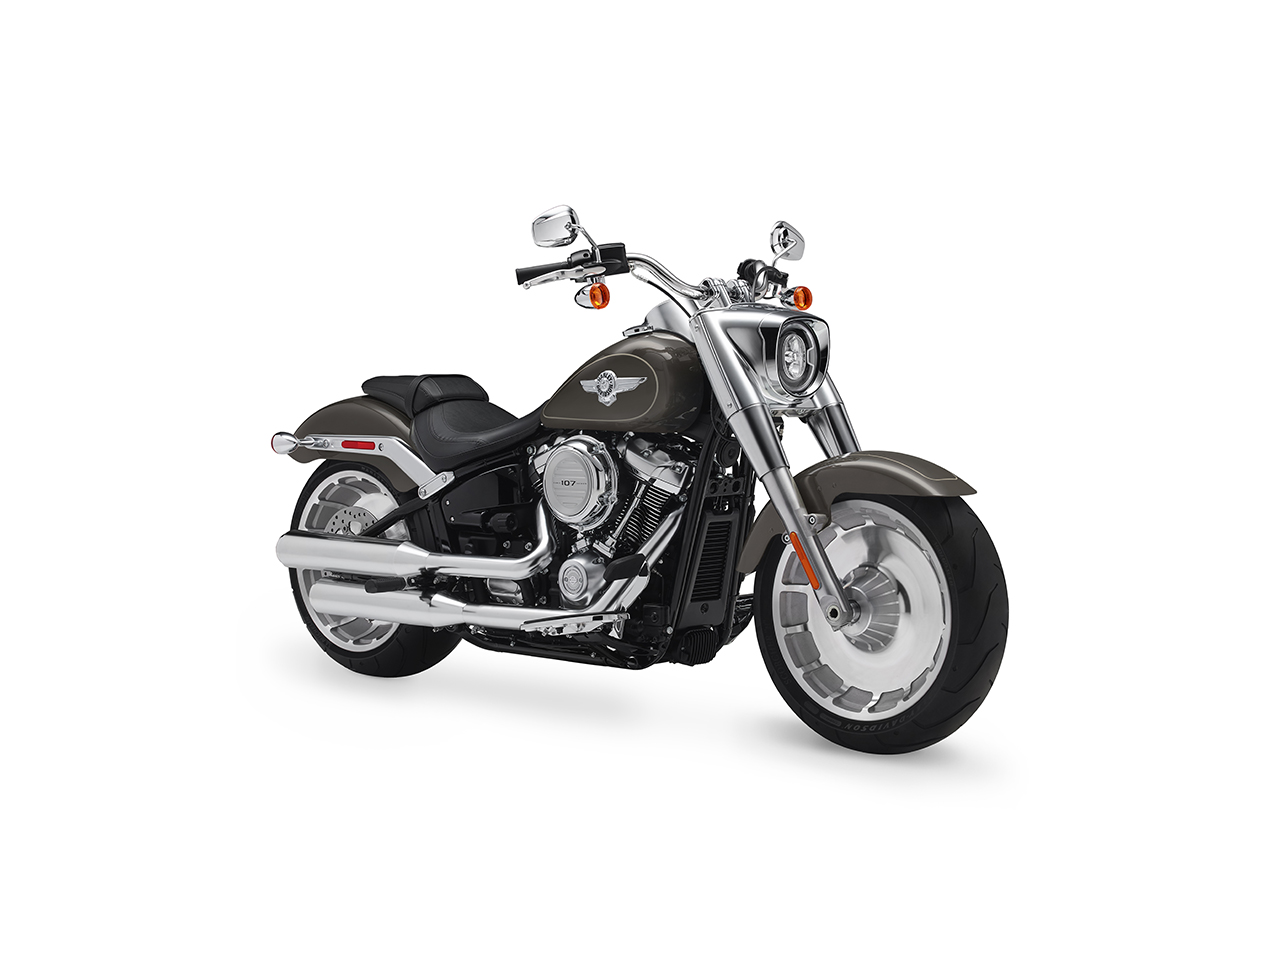 2018 Harley-Davidson Fat Boy Image